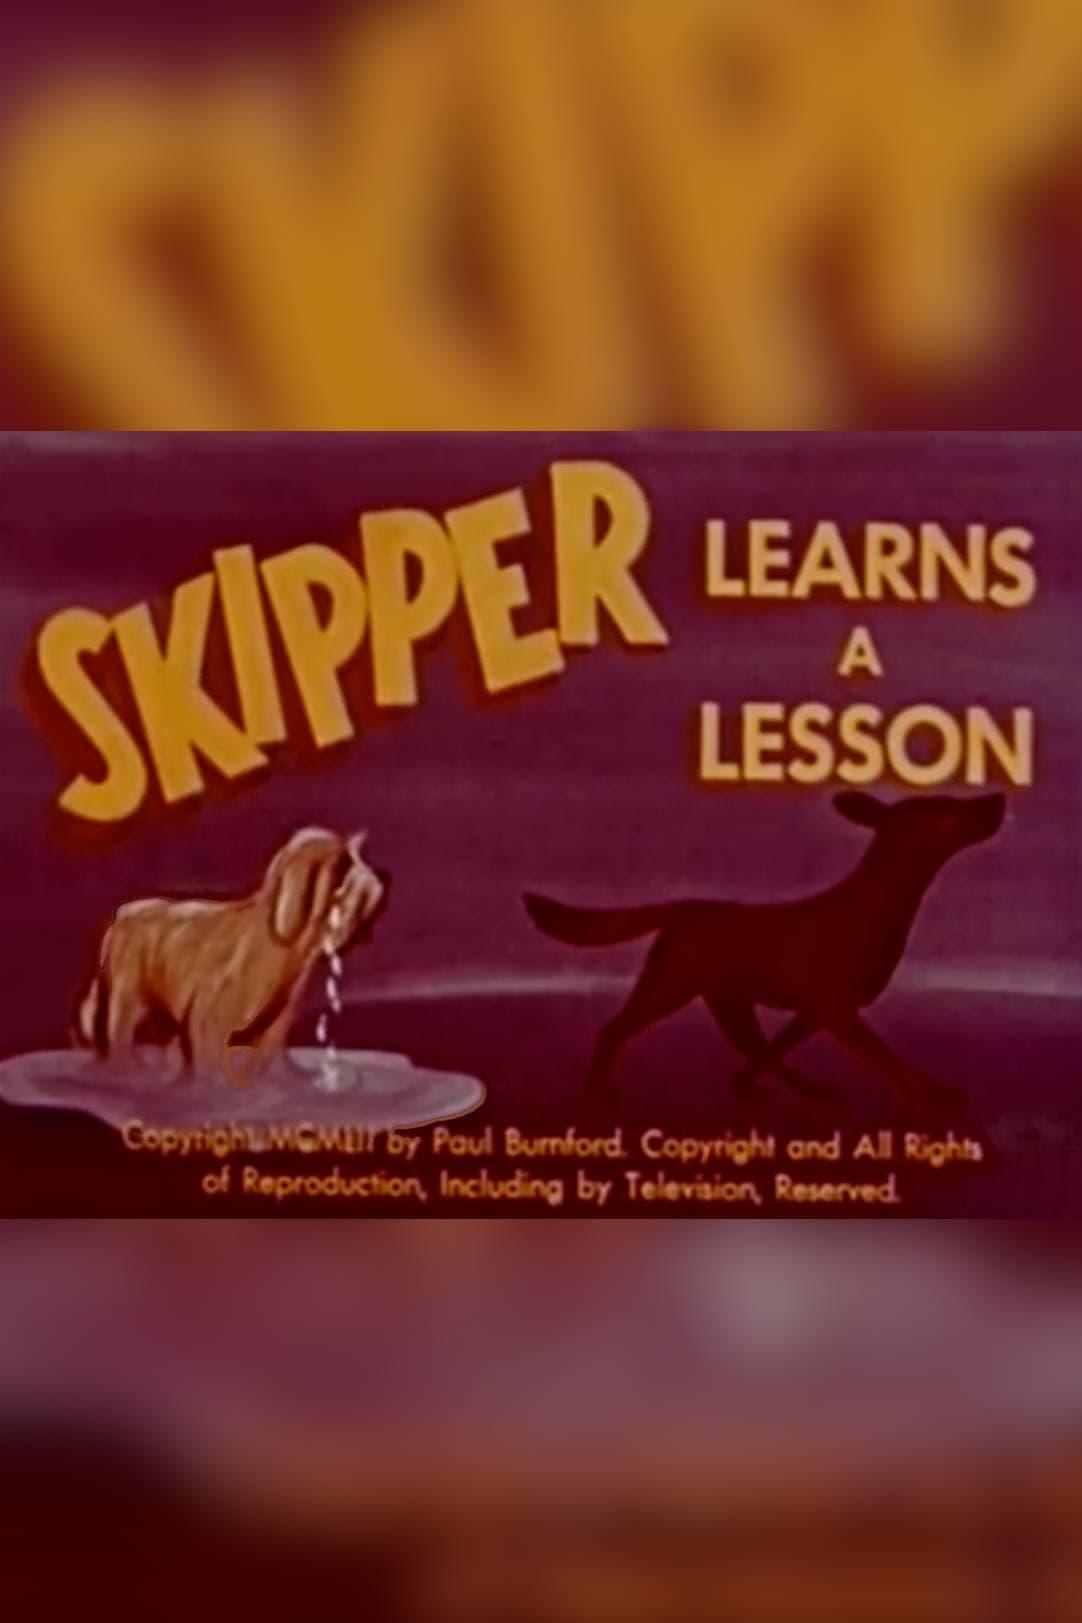 Skipper Learns A Lesson